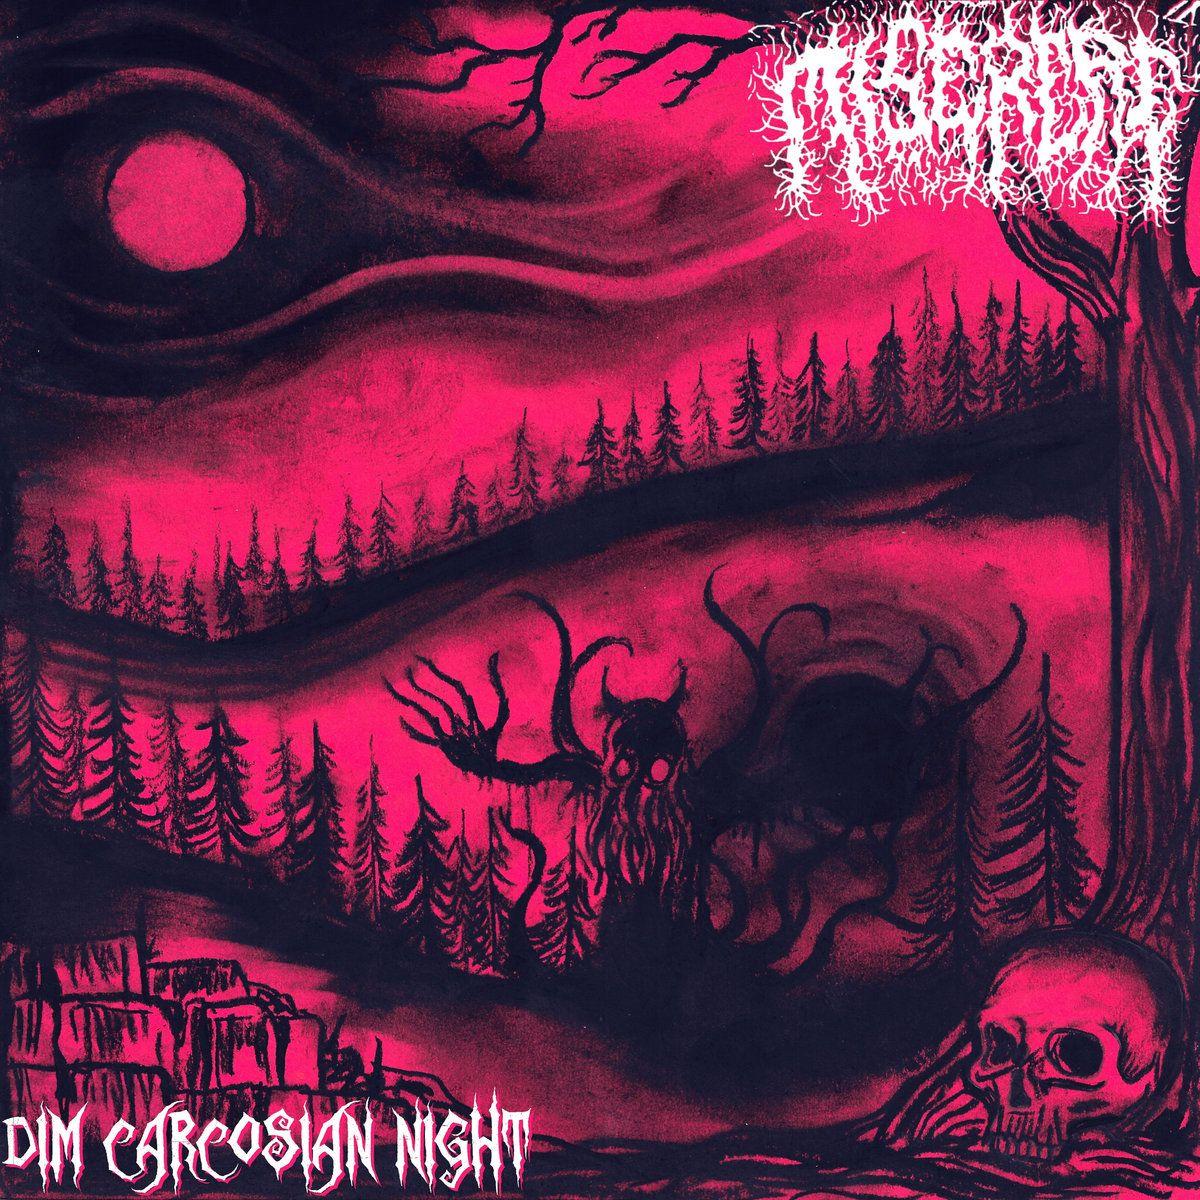 Miserere - Dim Carcosian Night